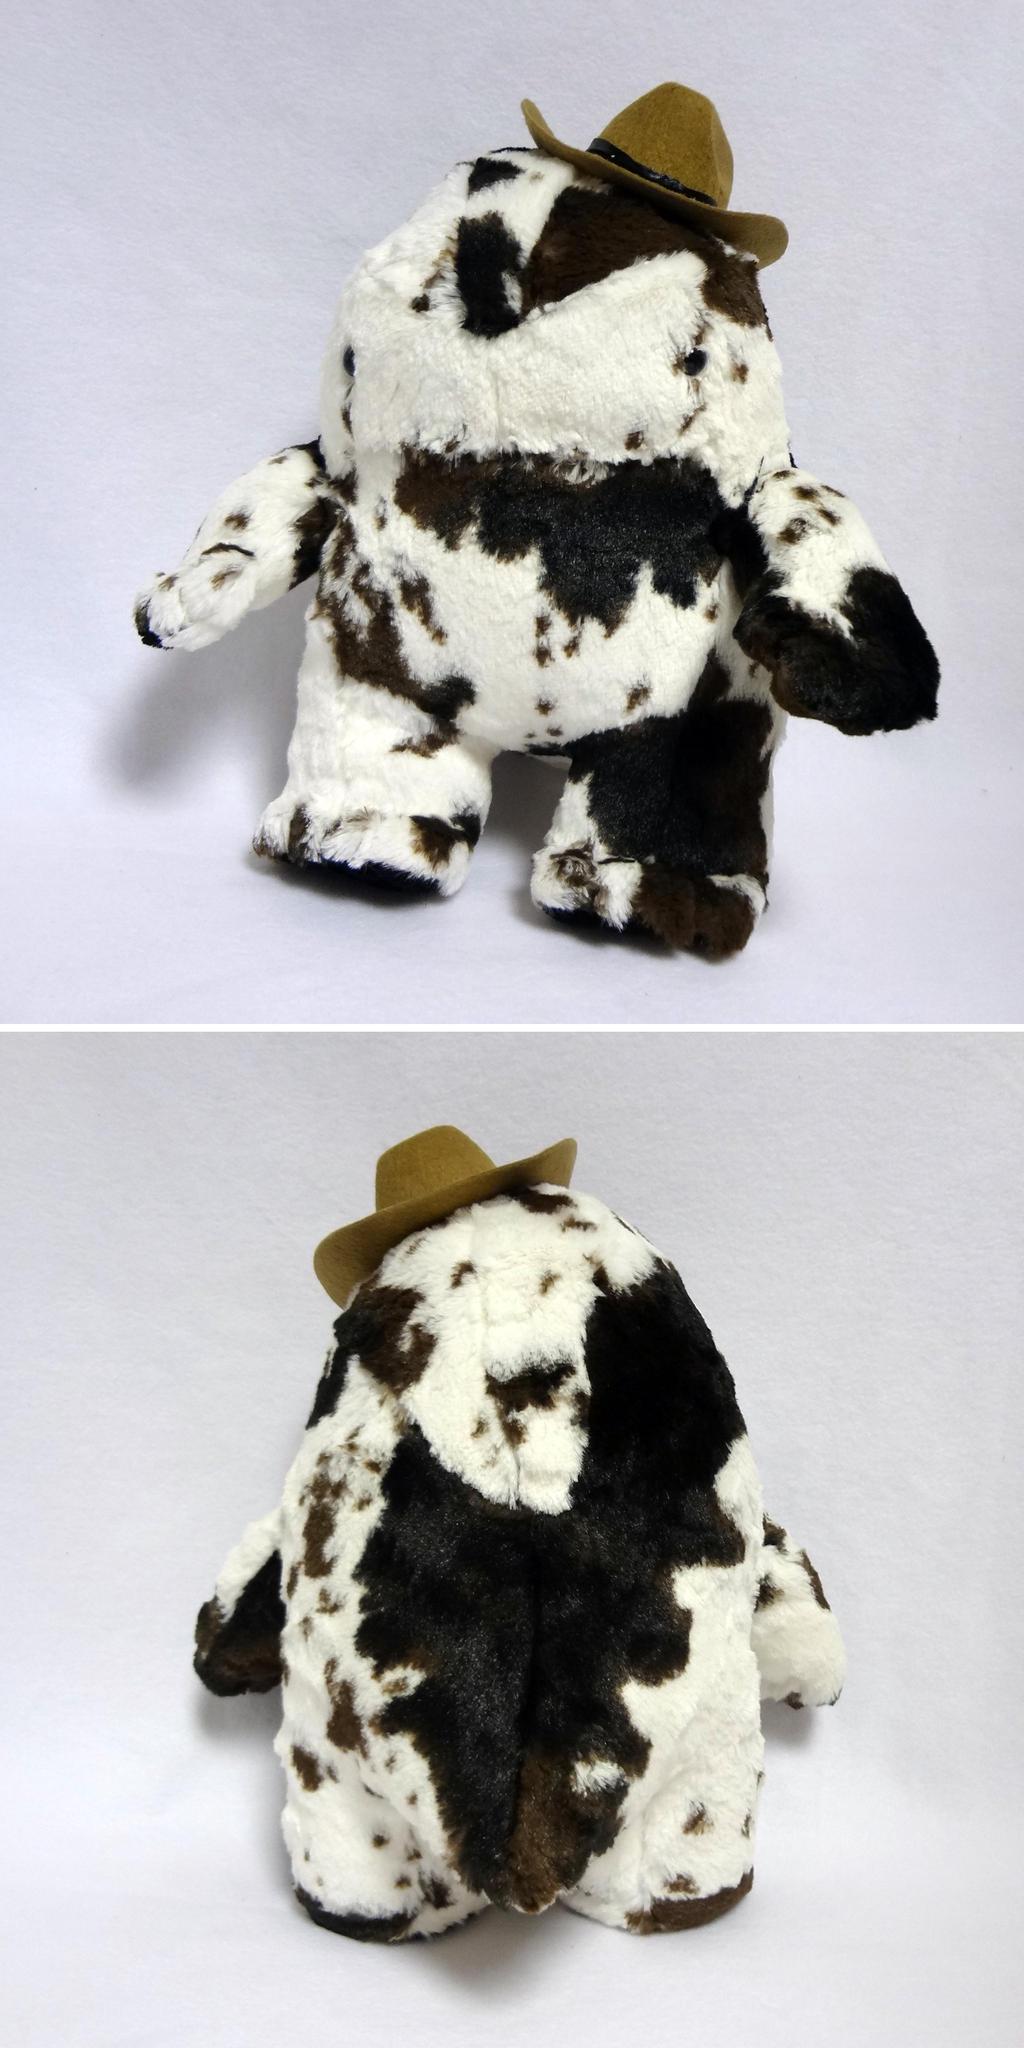 Cow-ggan by Koreena